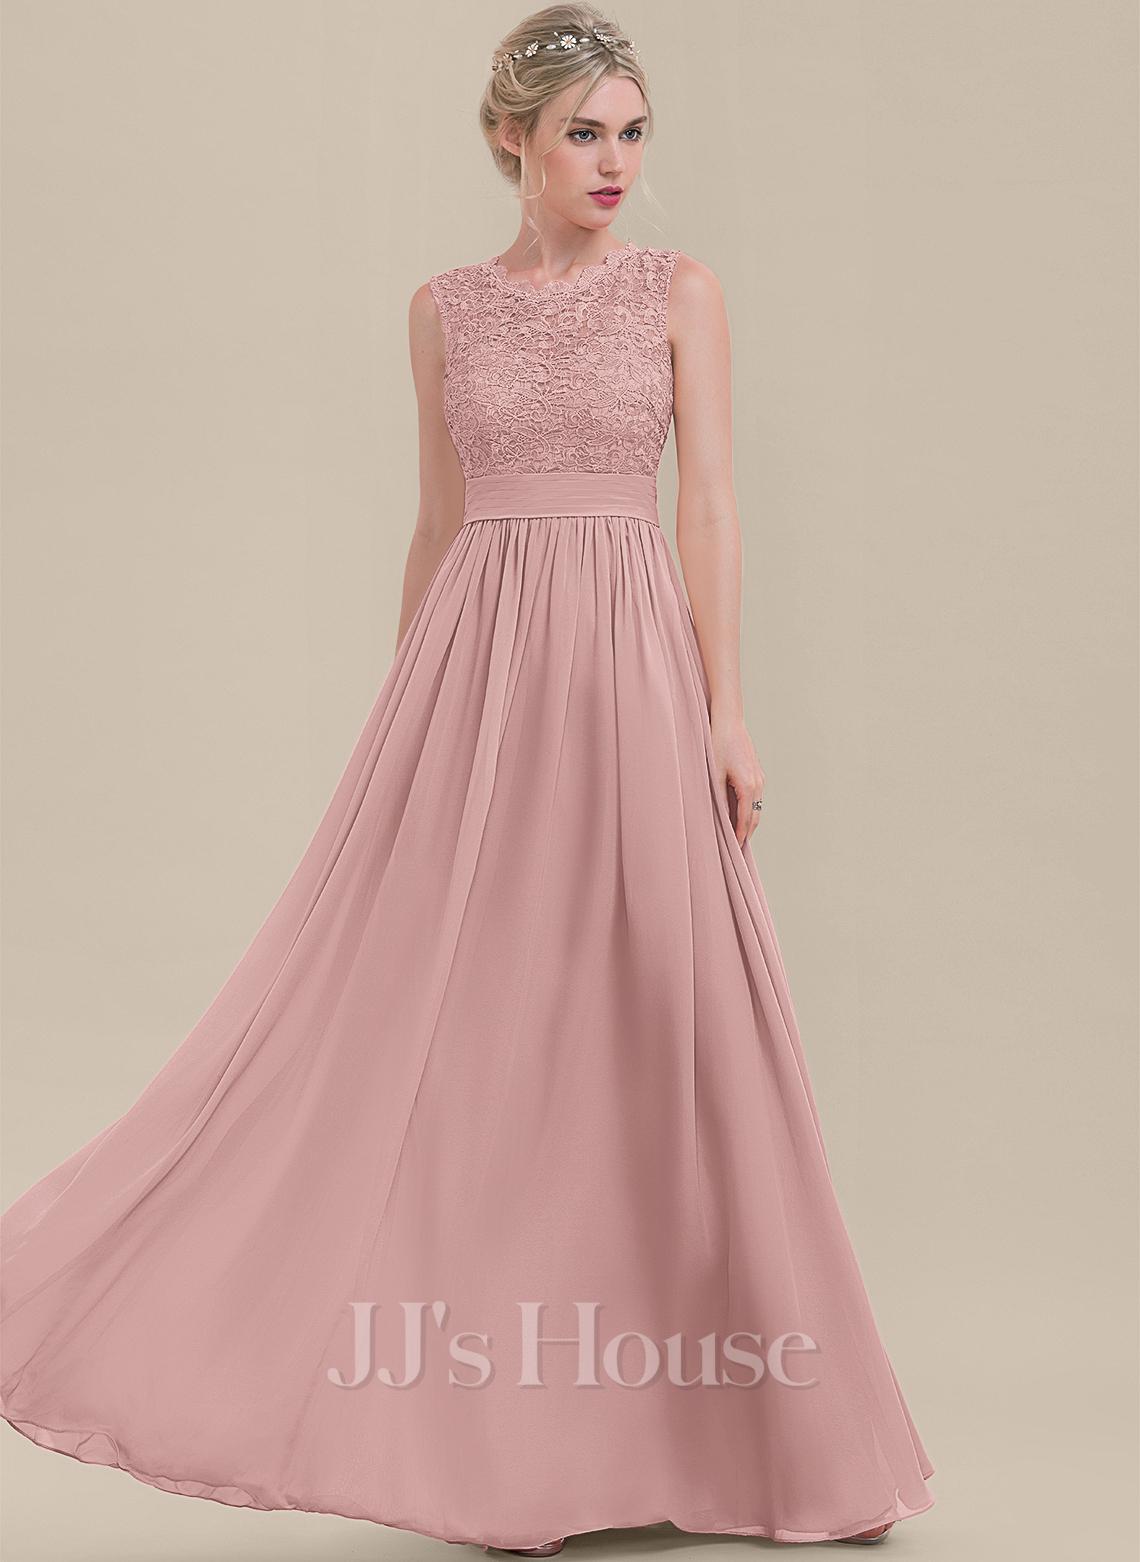 Scoop Neck Floor-Length Chiffon Lace Bridesmaid Dress